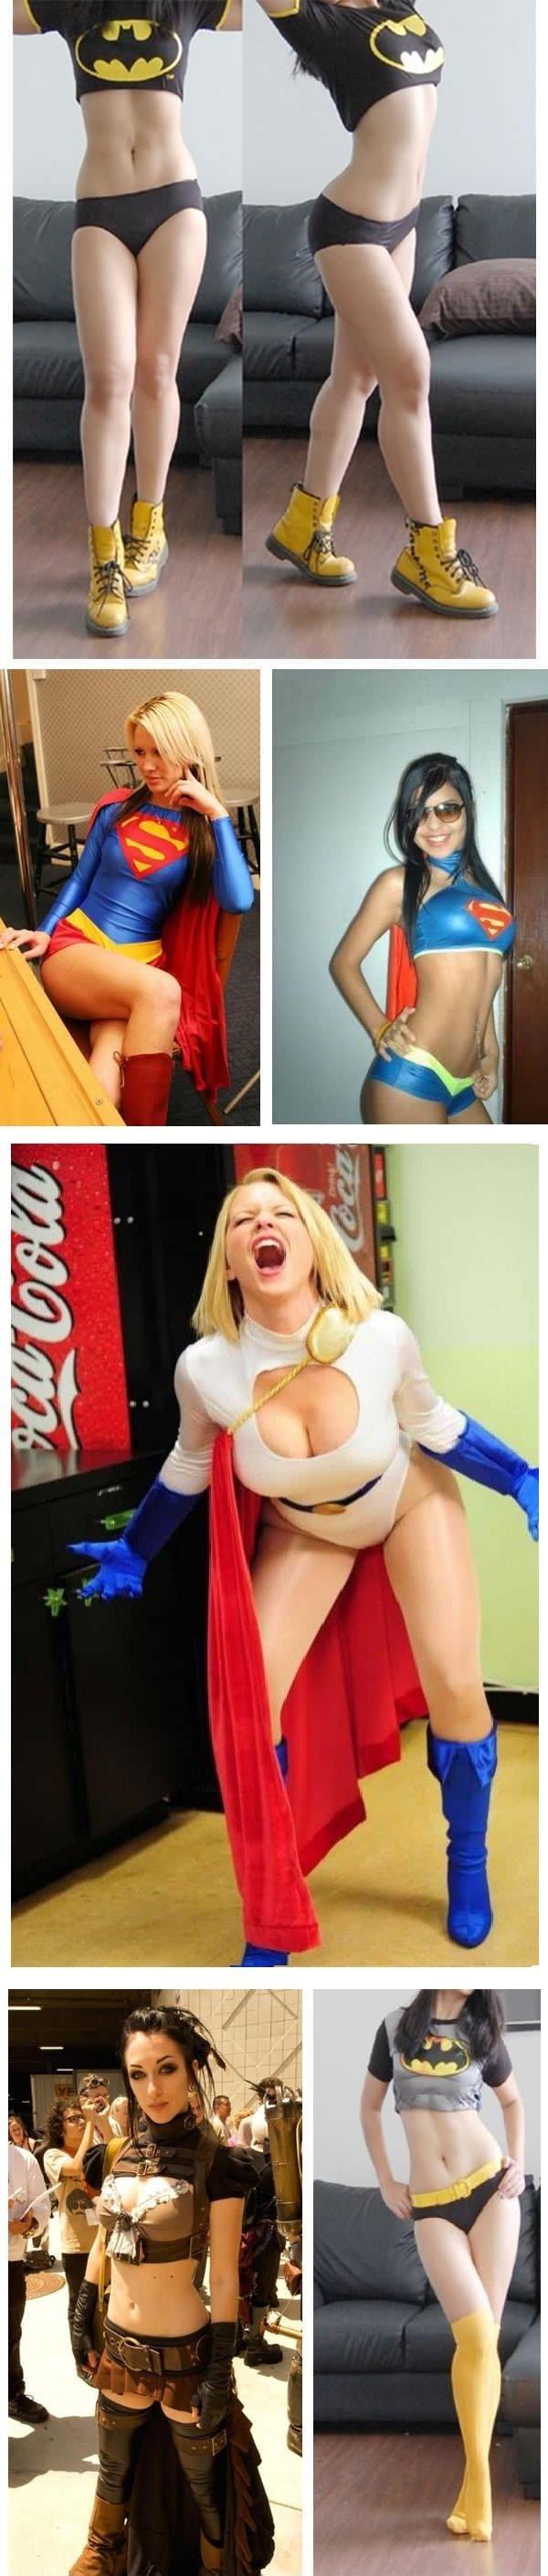 cosplay. .